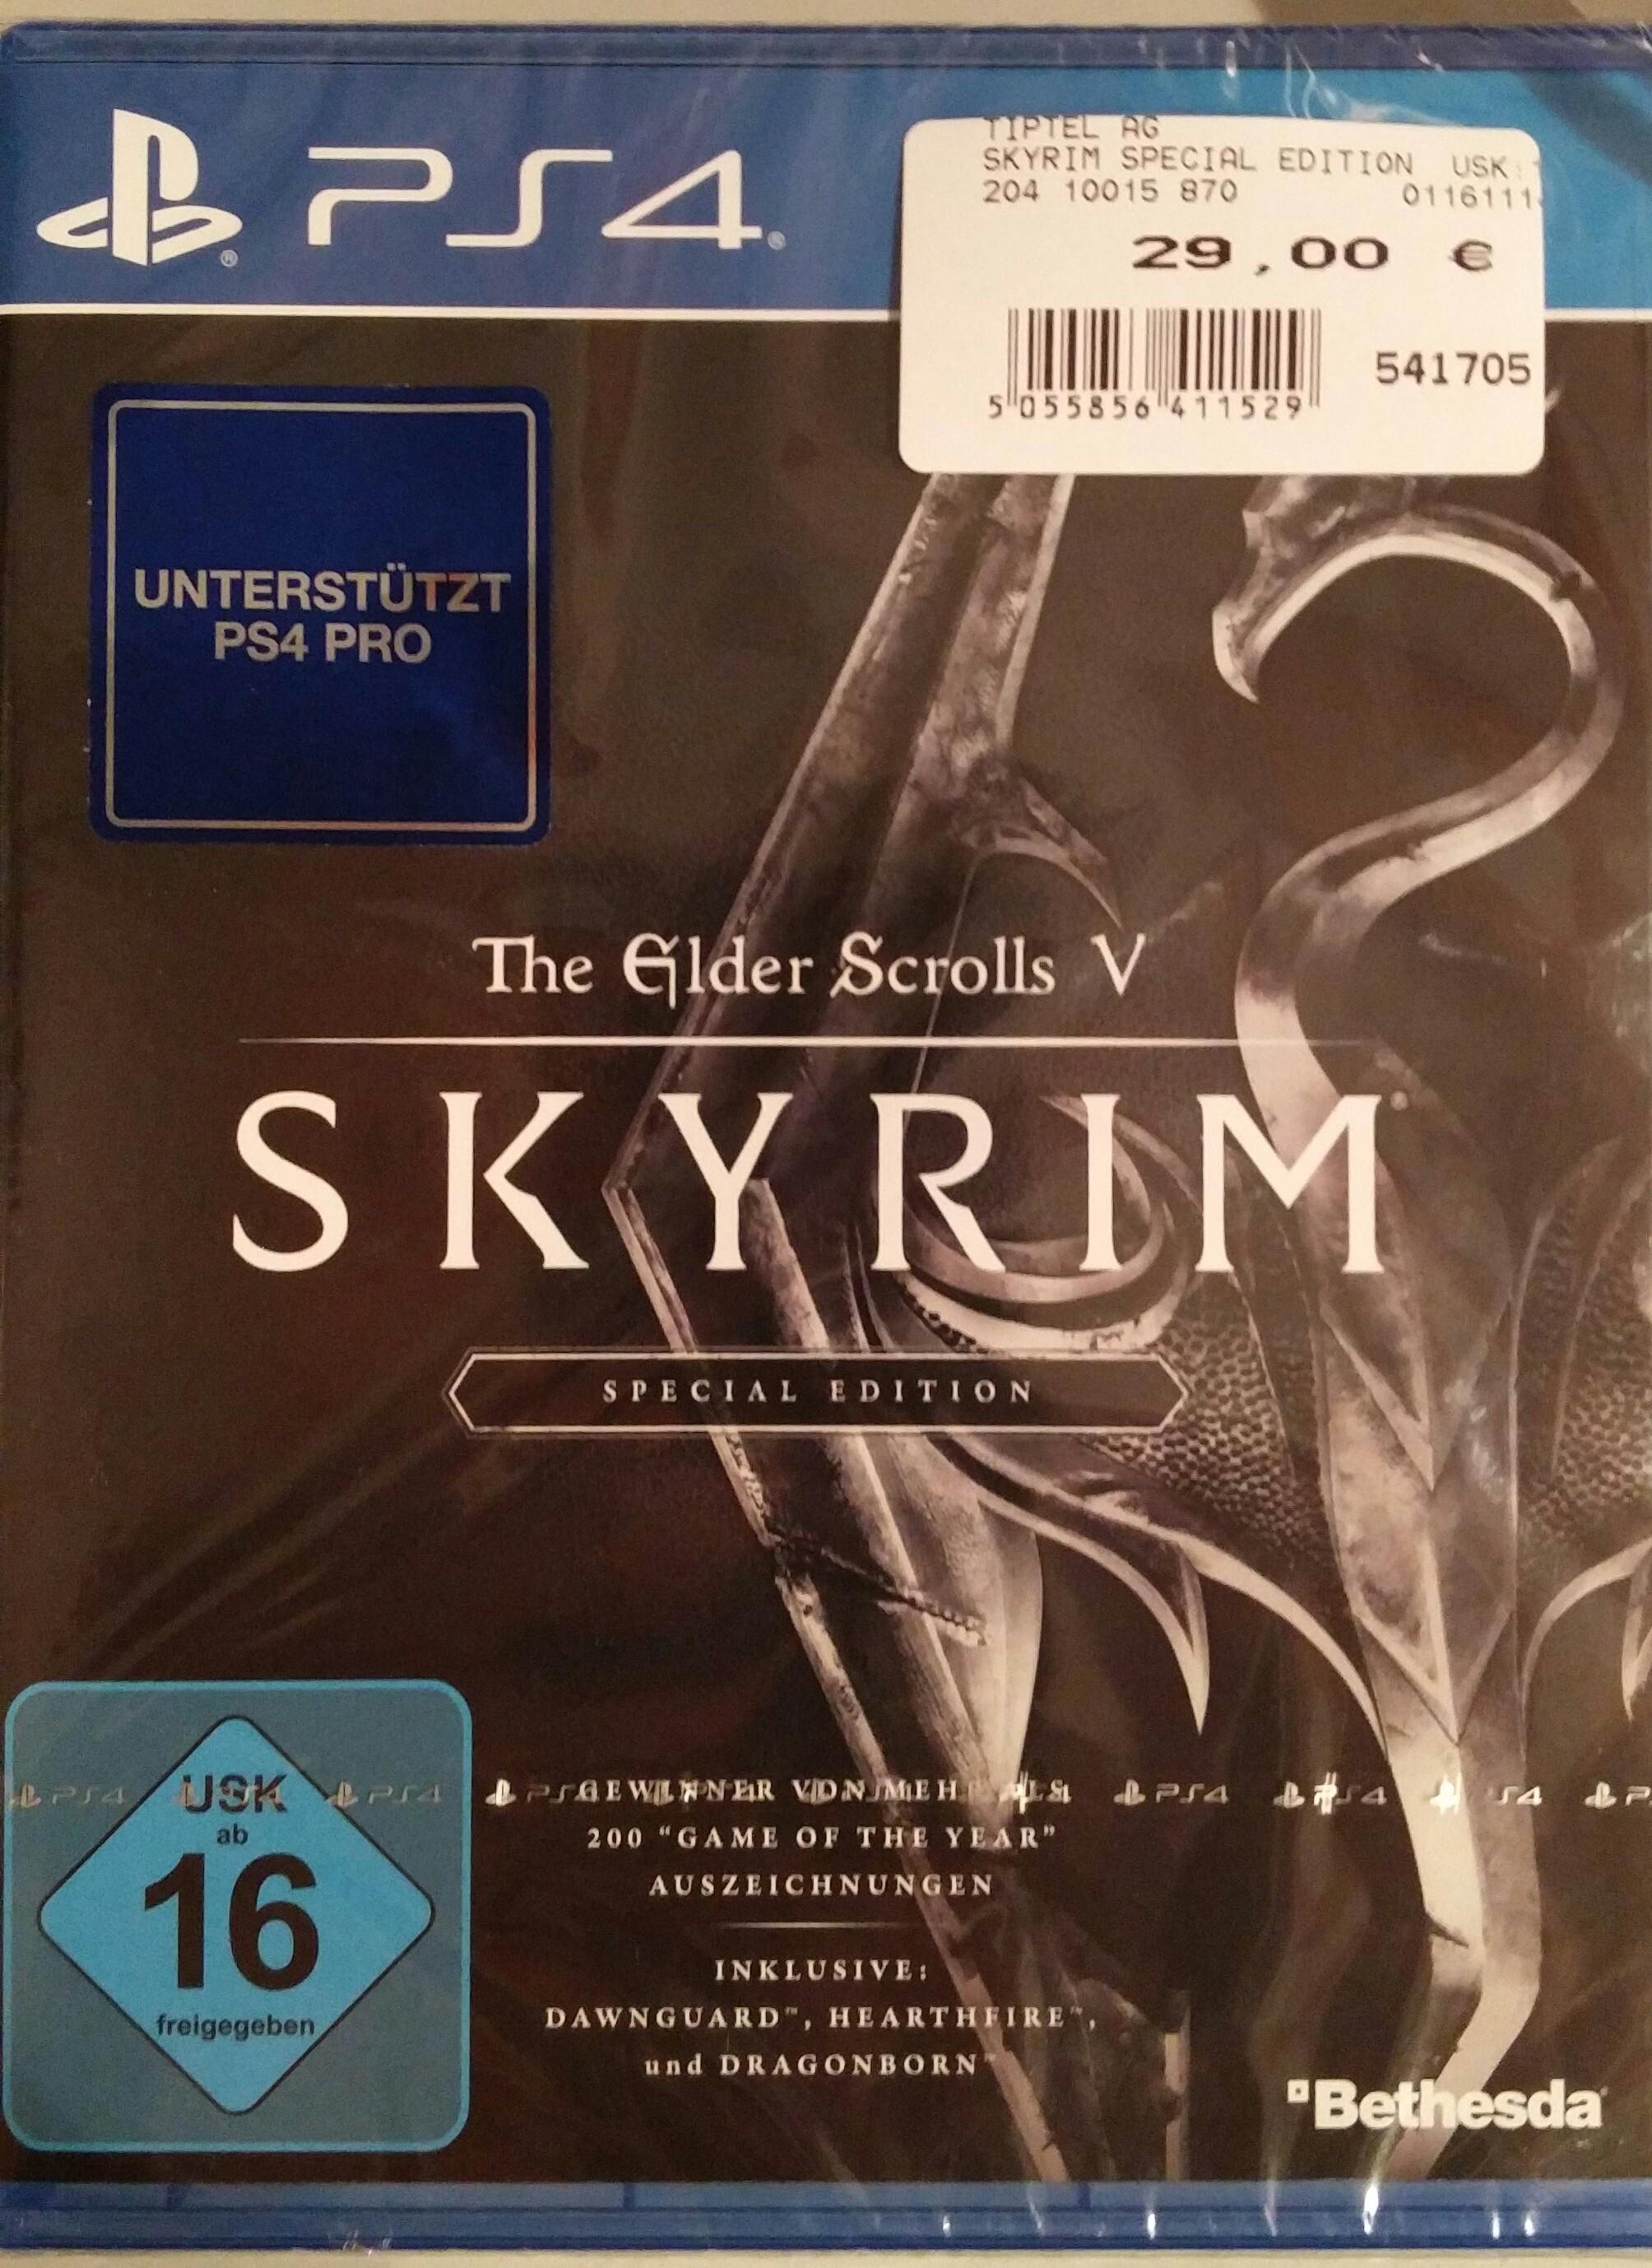 Lokal: Skyrim PS4 Expert Burgdorf